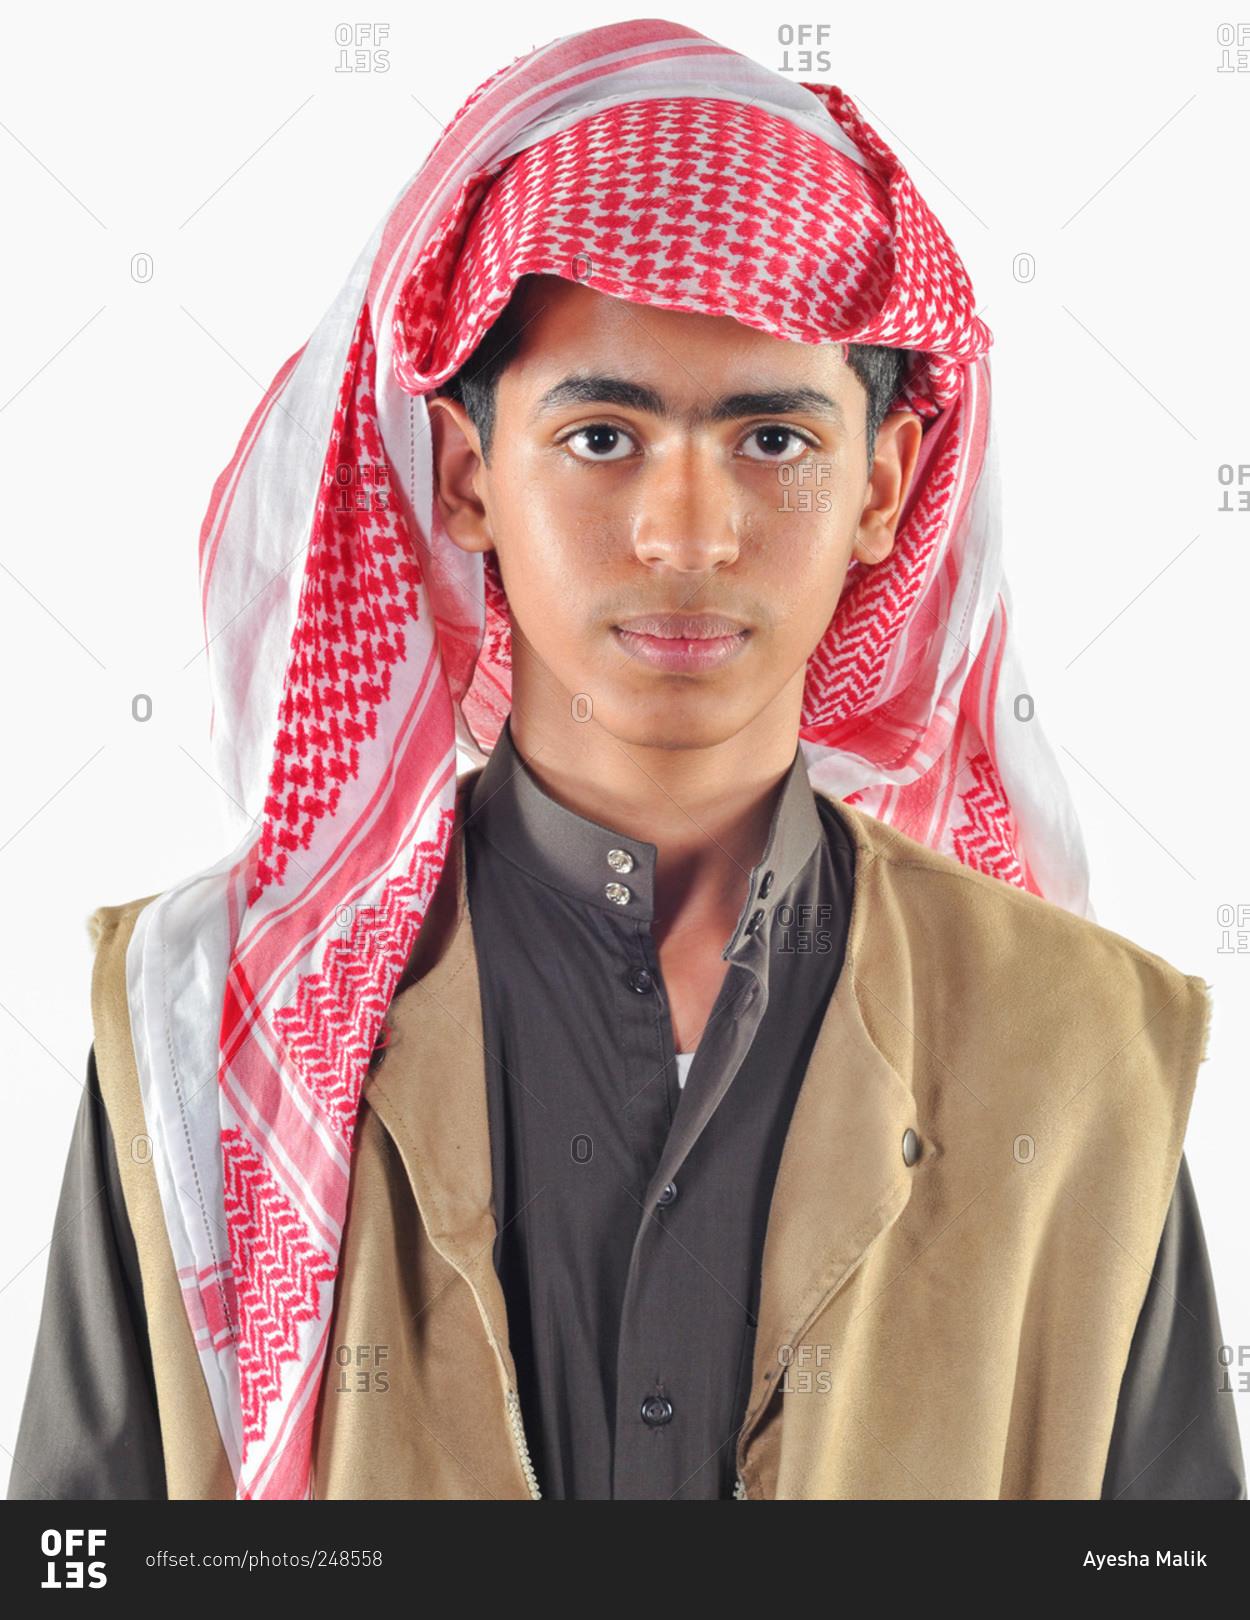 Dhahran, Eastern Province, Saudi Arabia - December 3, 2009 -2673